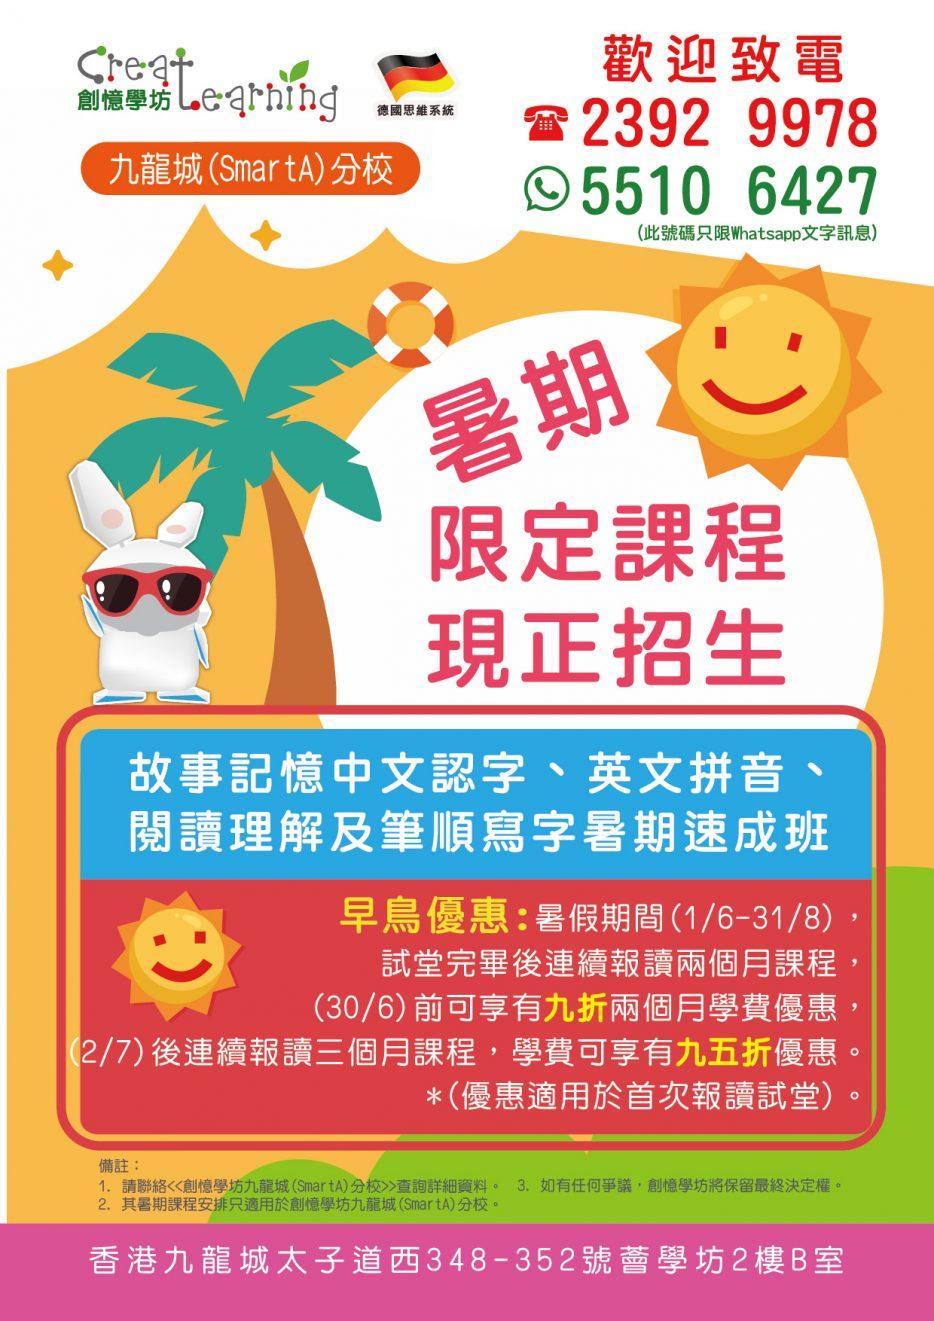 A4_KLNC_Summer_Leaflet_20210521-01